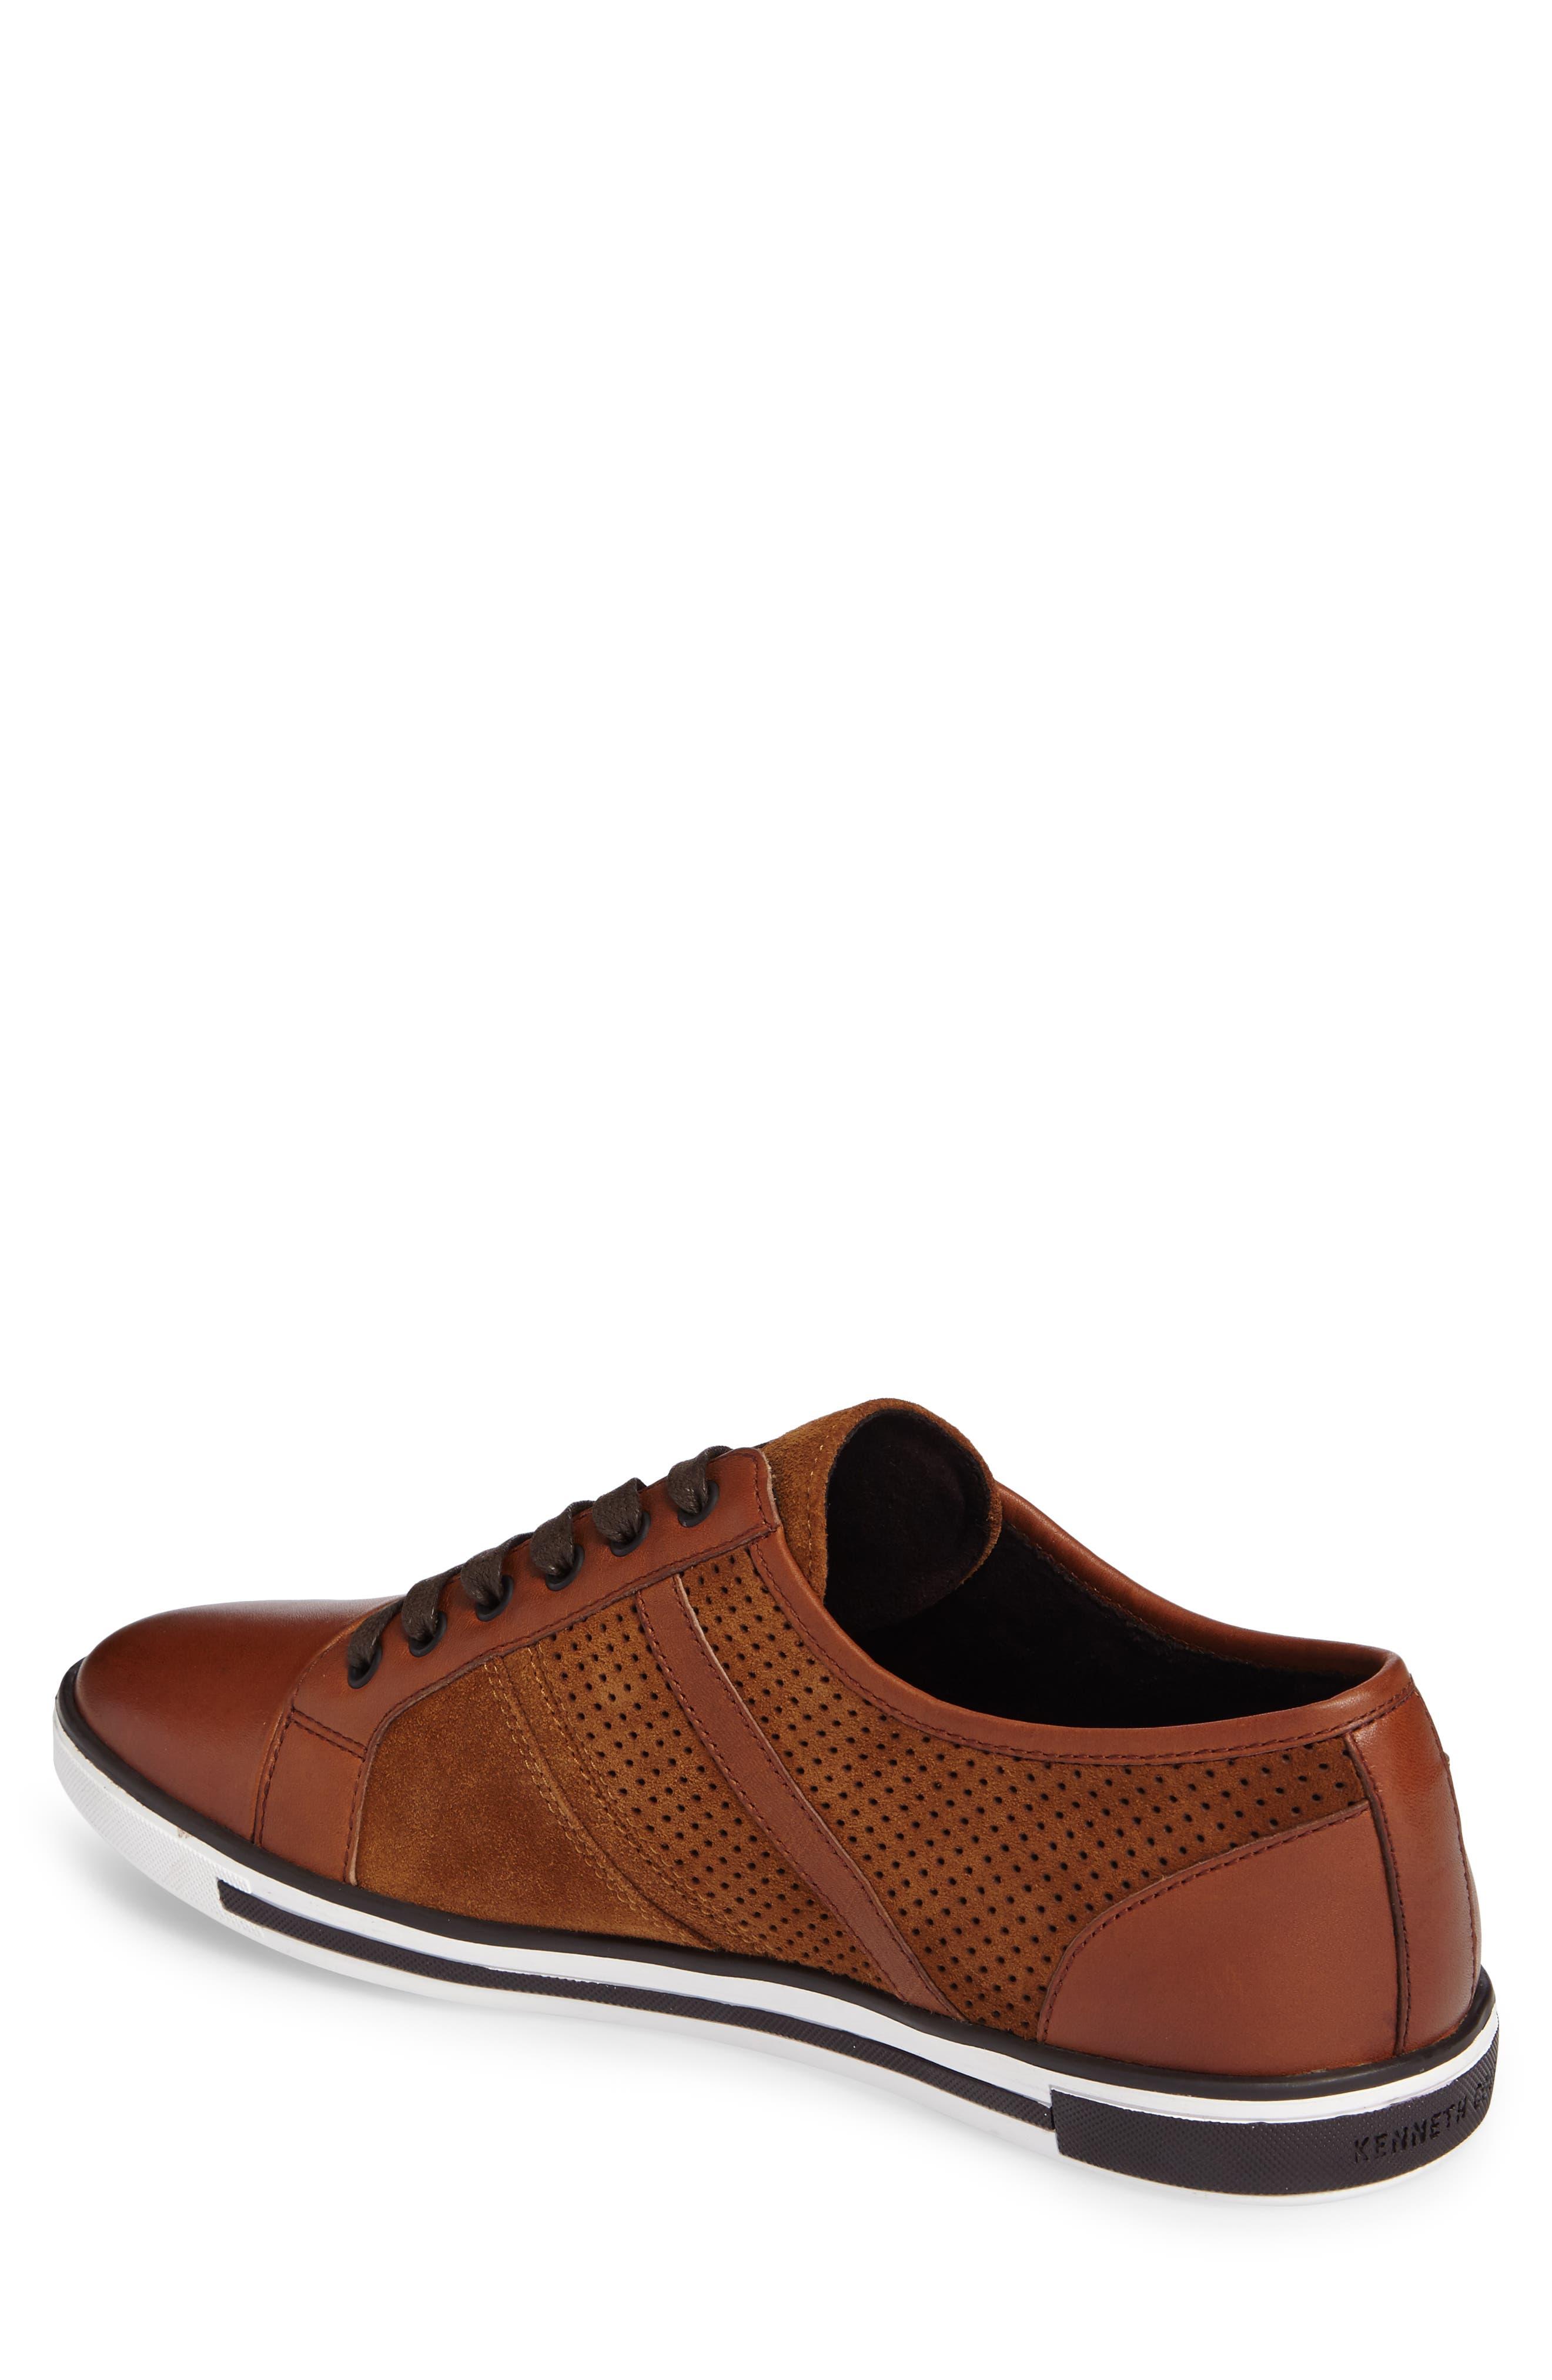 Alternate Image 2  - Kenneth Cole New York Initial Step Sneaker (Men)